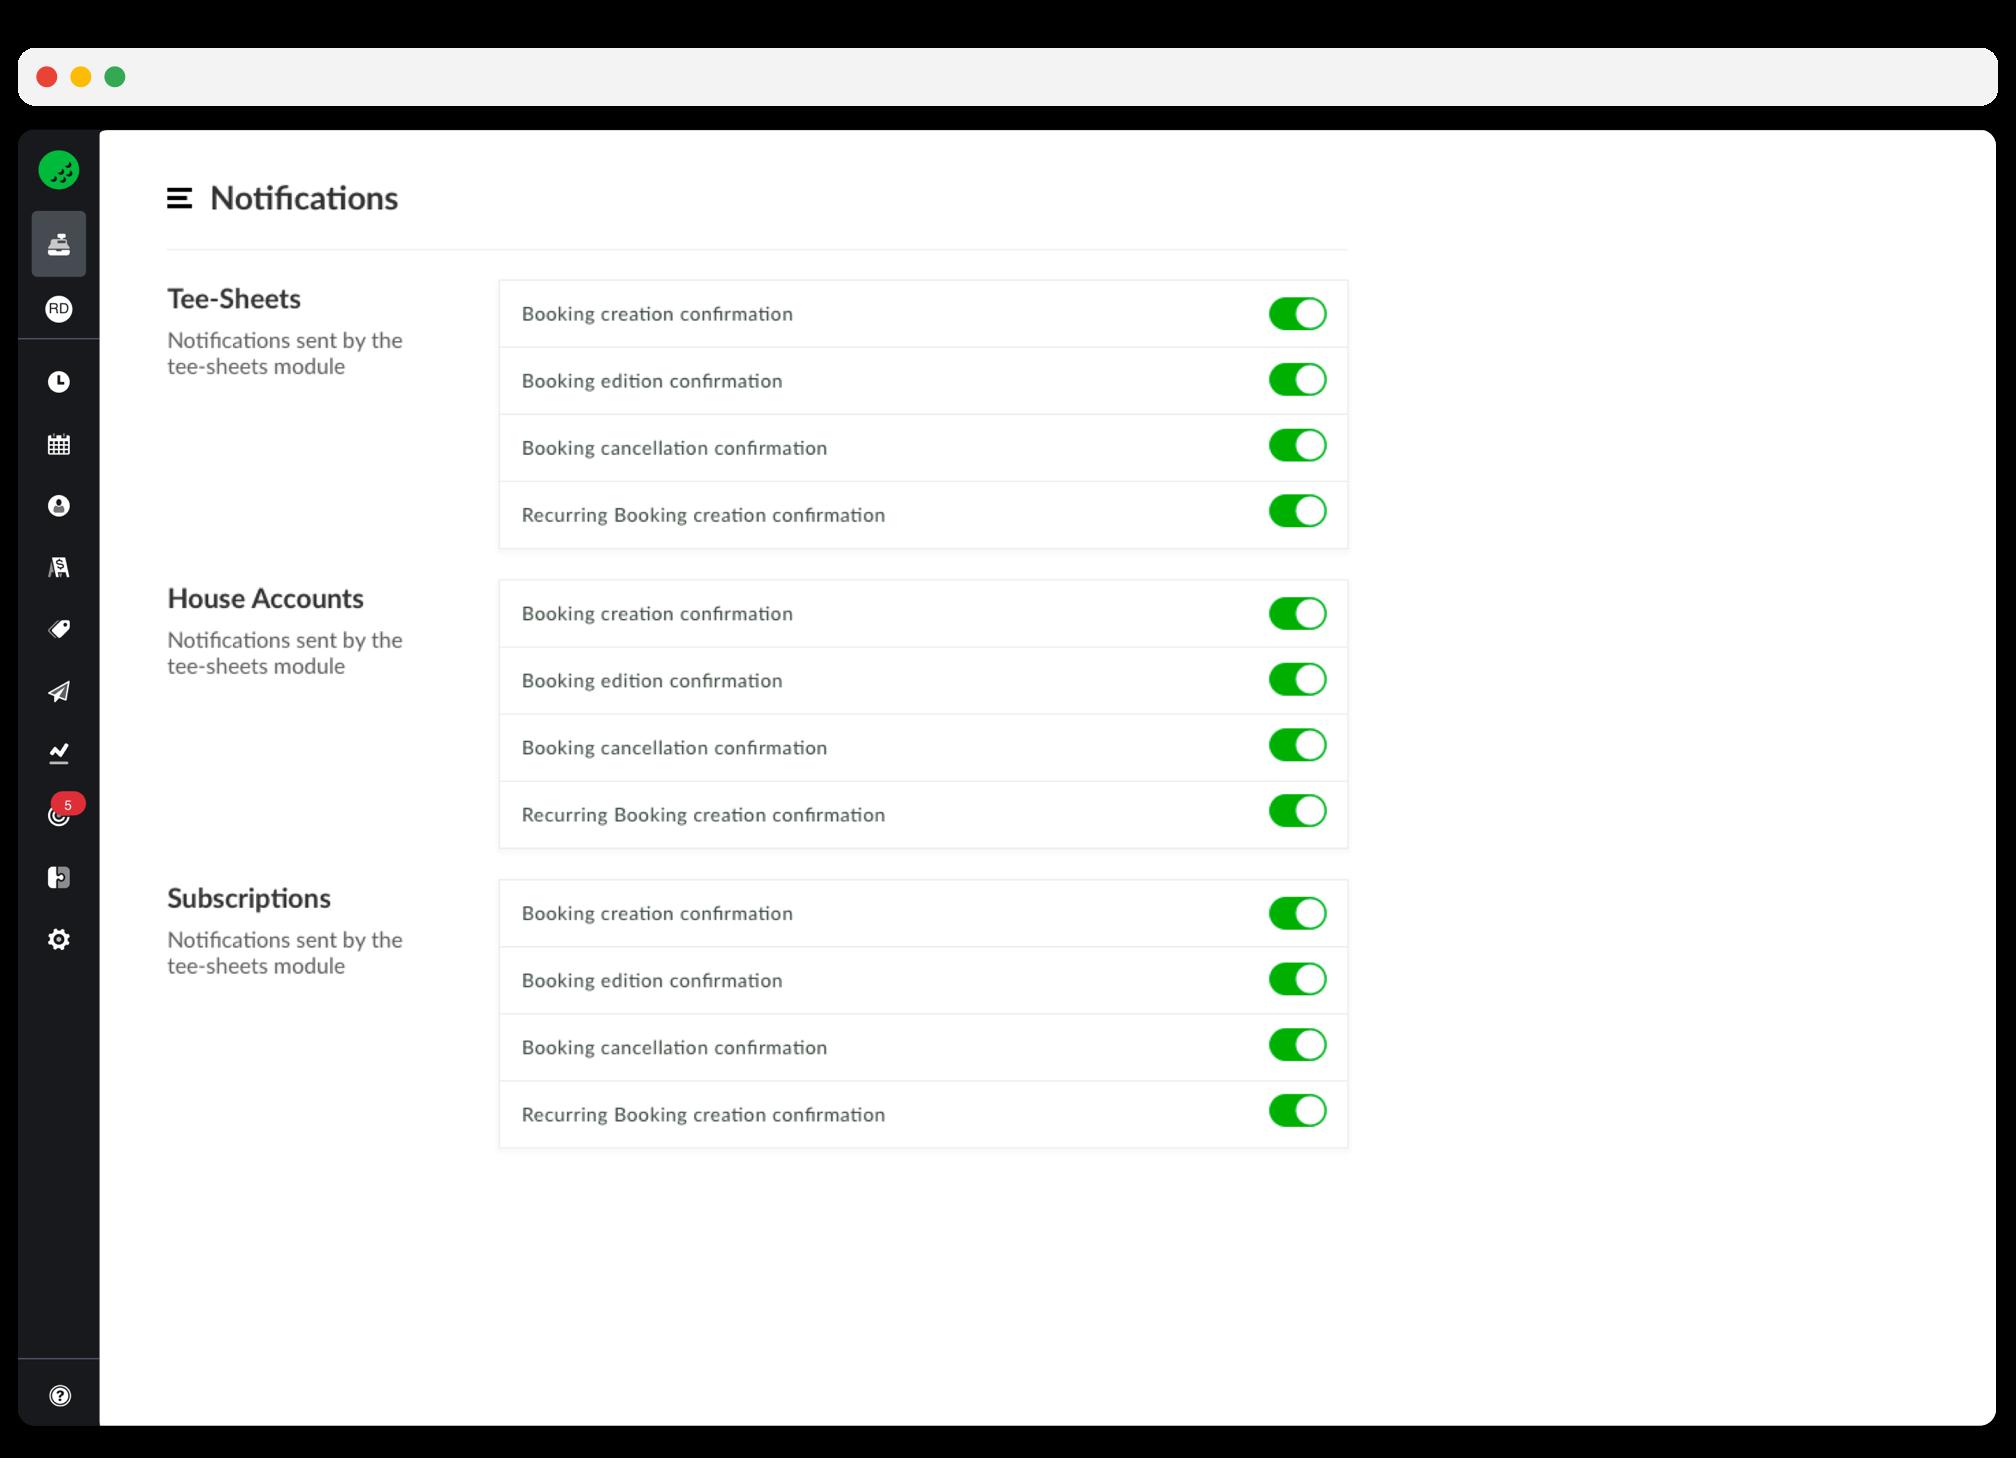 dynamic-pricing-screenshoot-interface-2